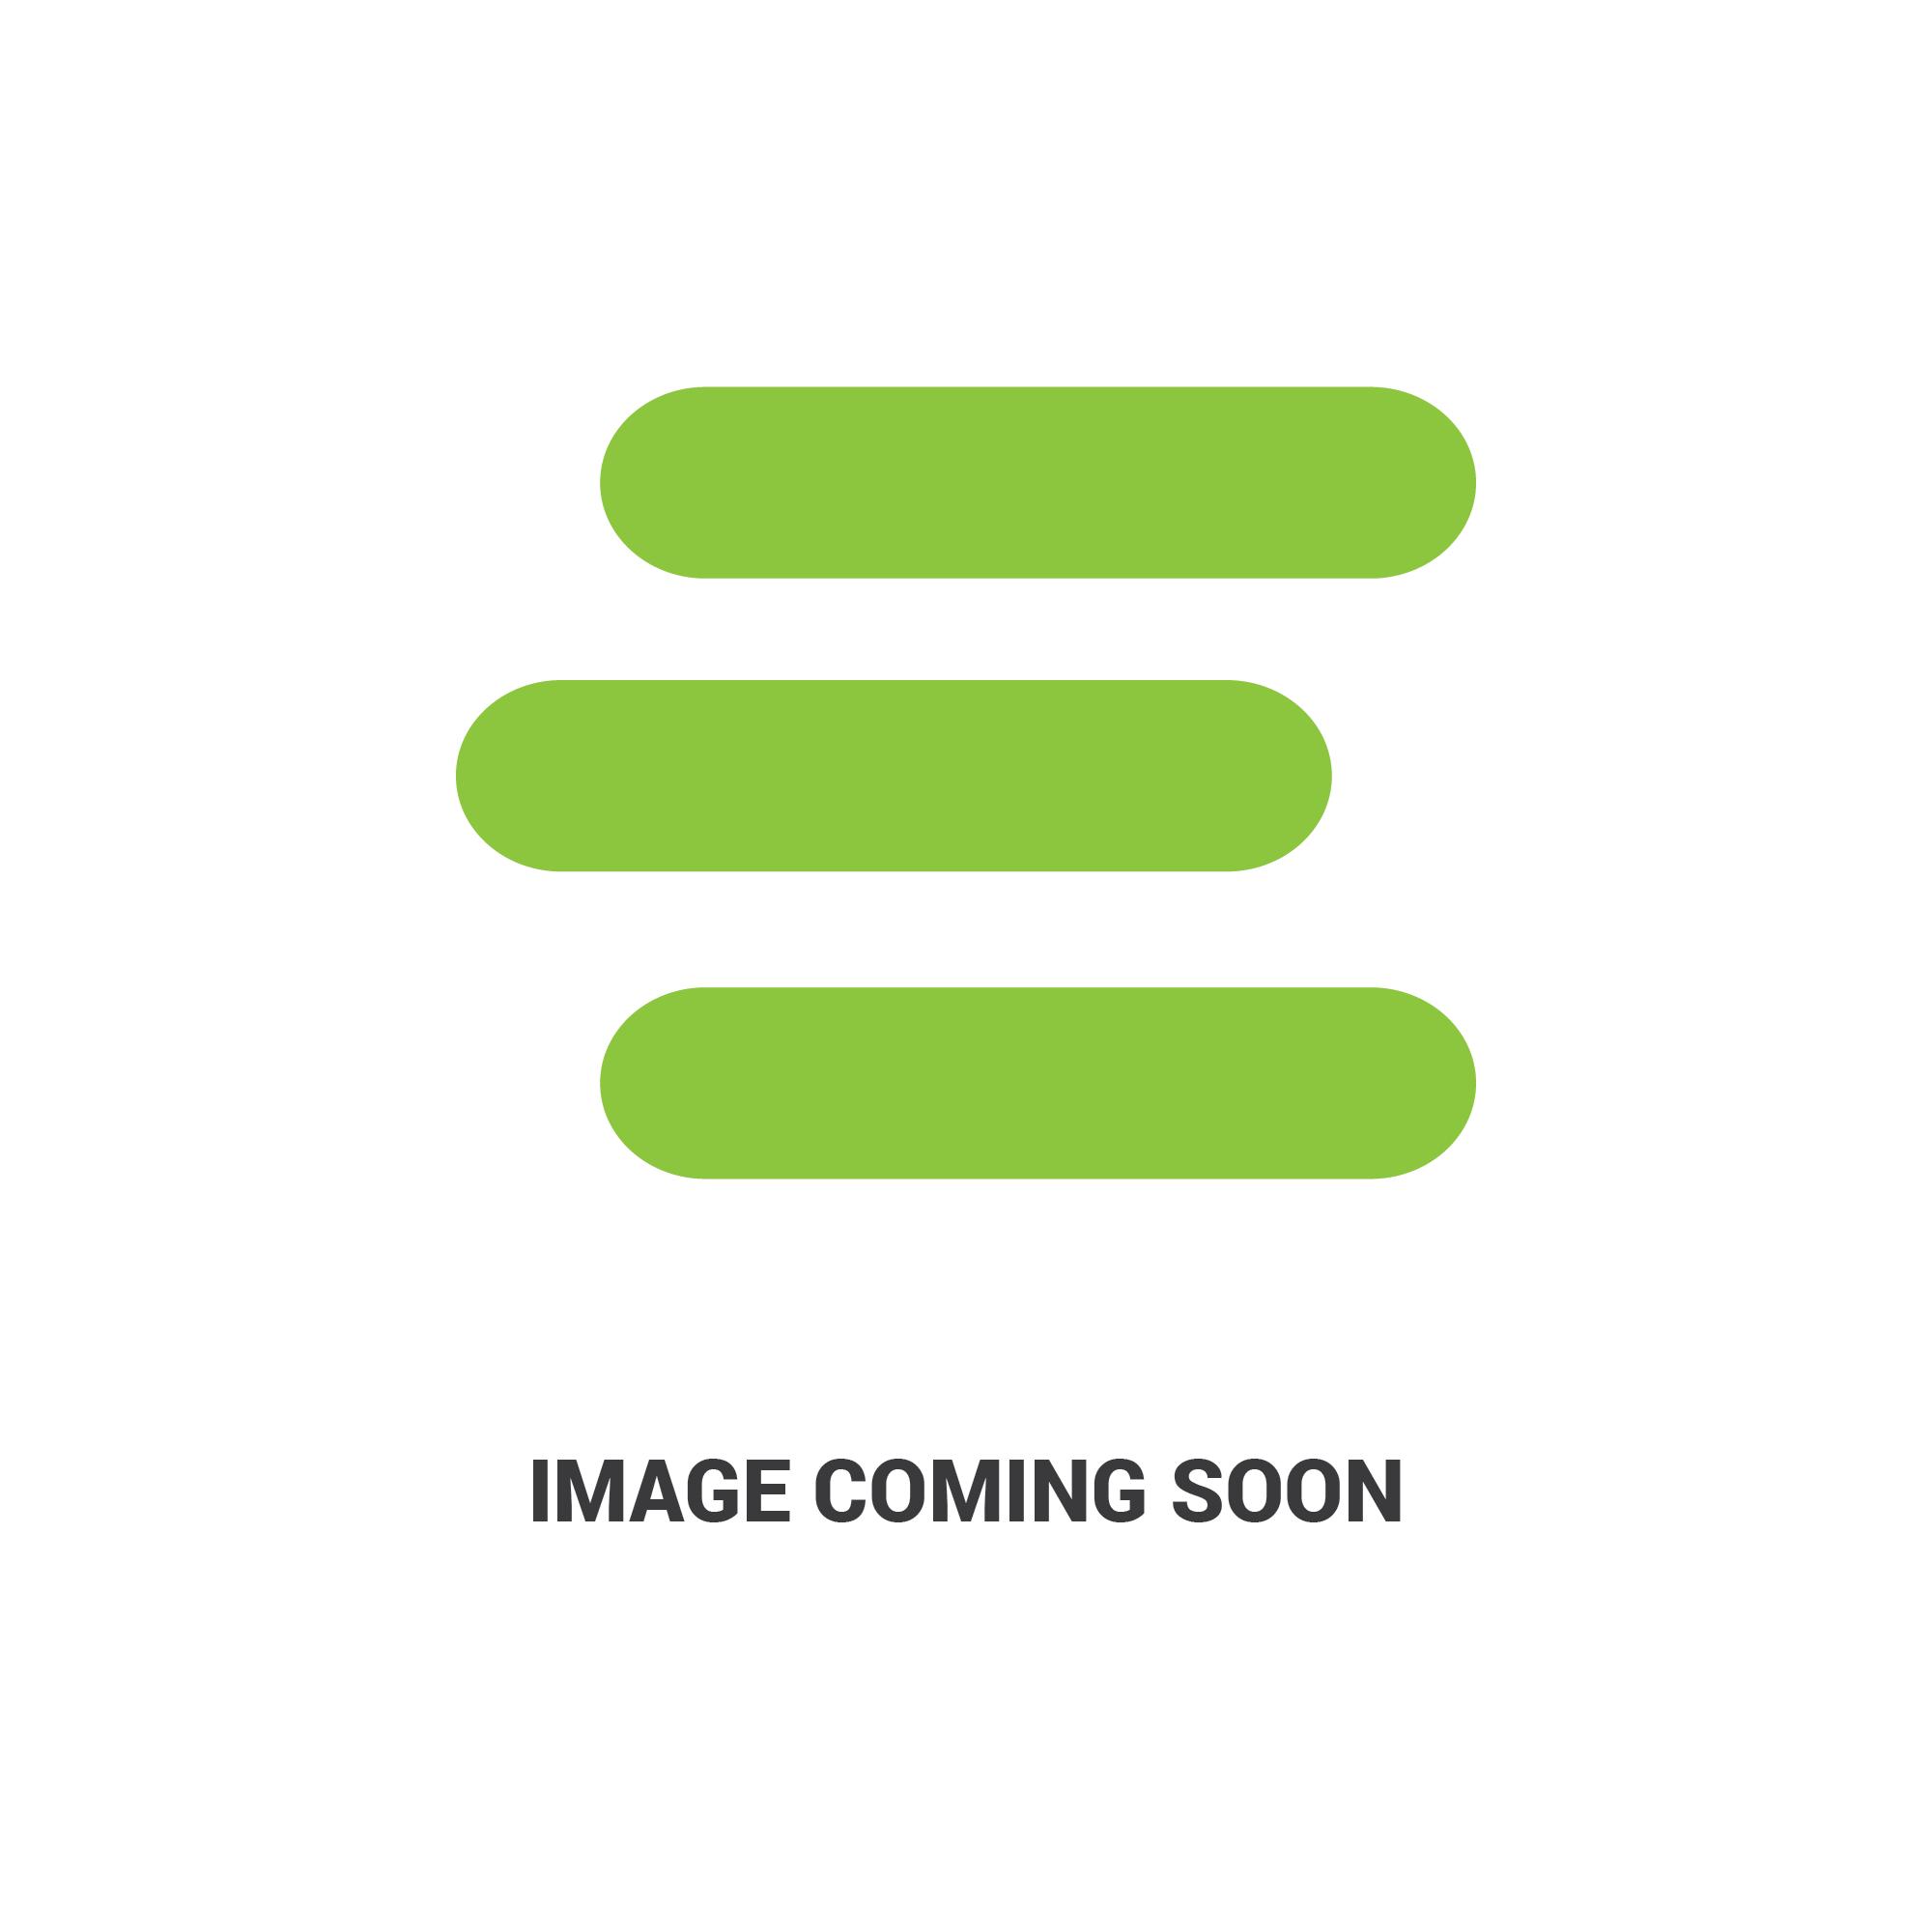 E-67448DD943_1.jpg